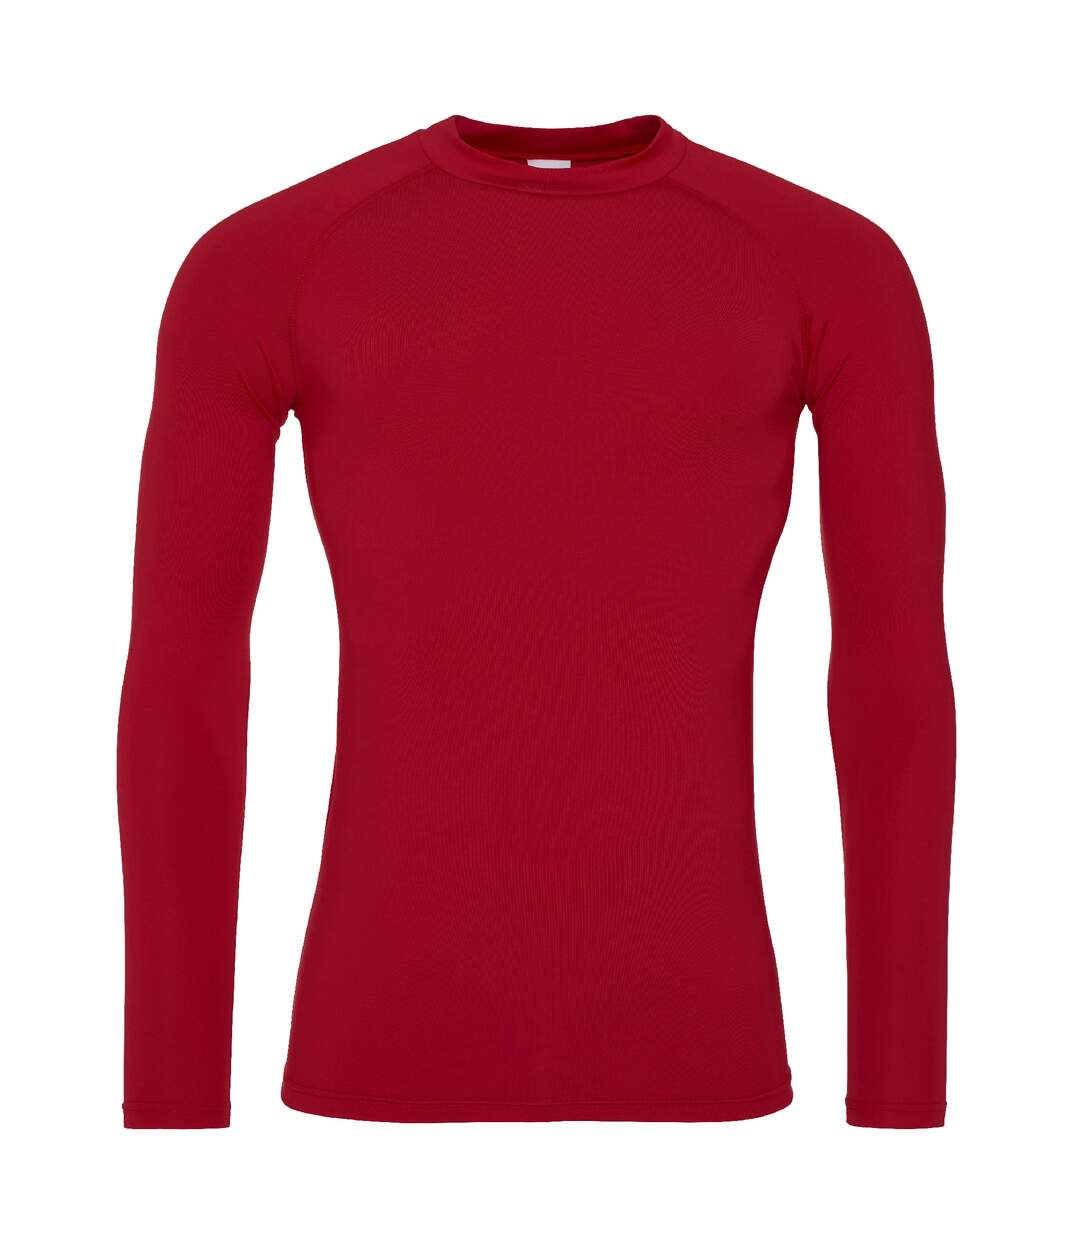 AWDis Just Cool Mens Long Sleeve Baselayer Top (Fire Red) - UTRW5356